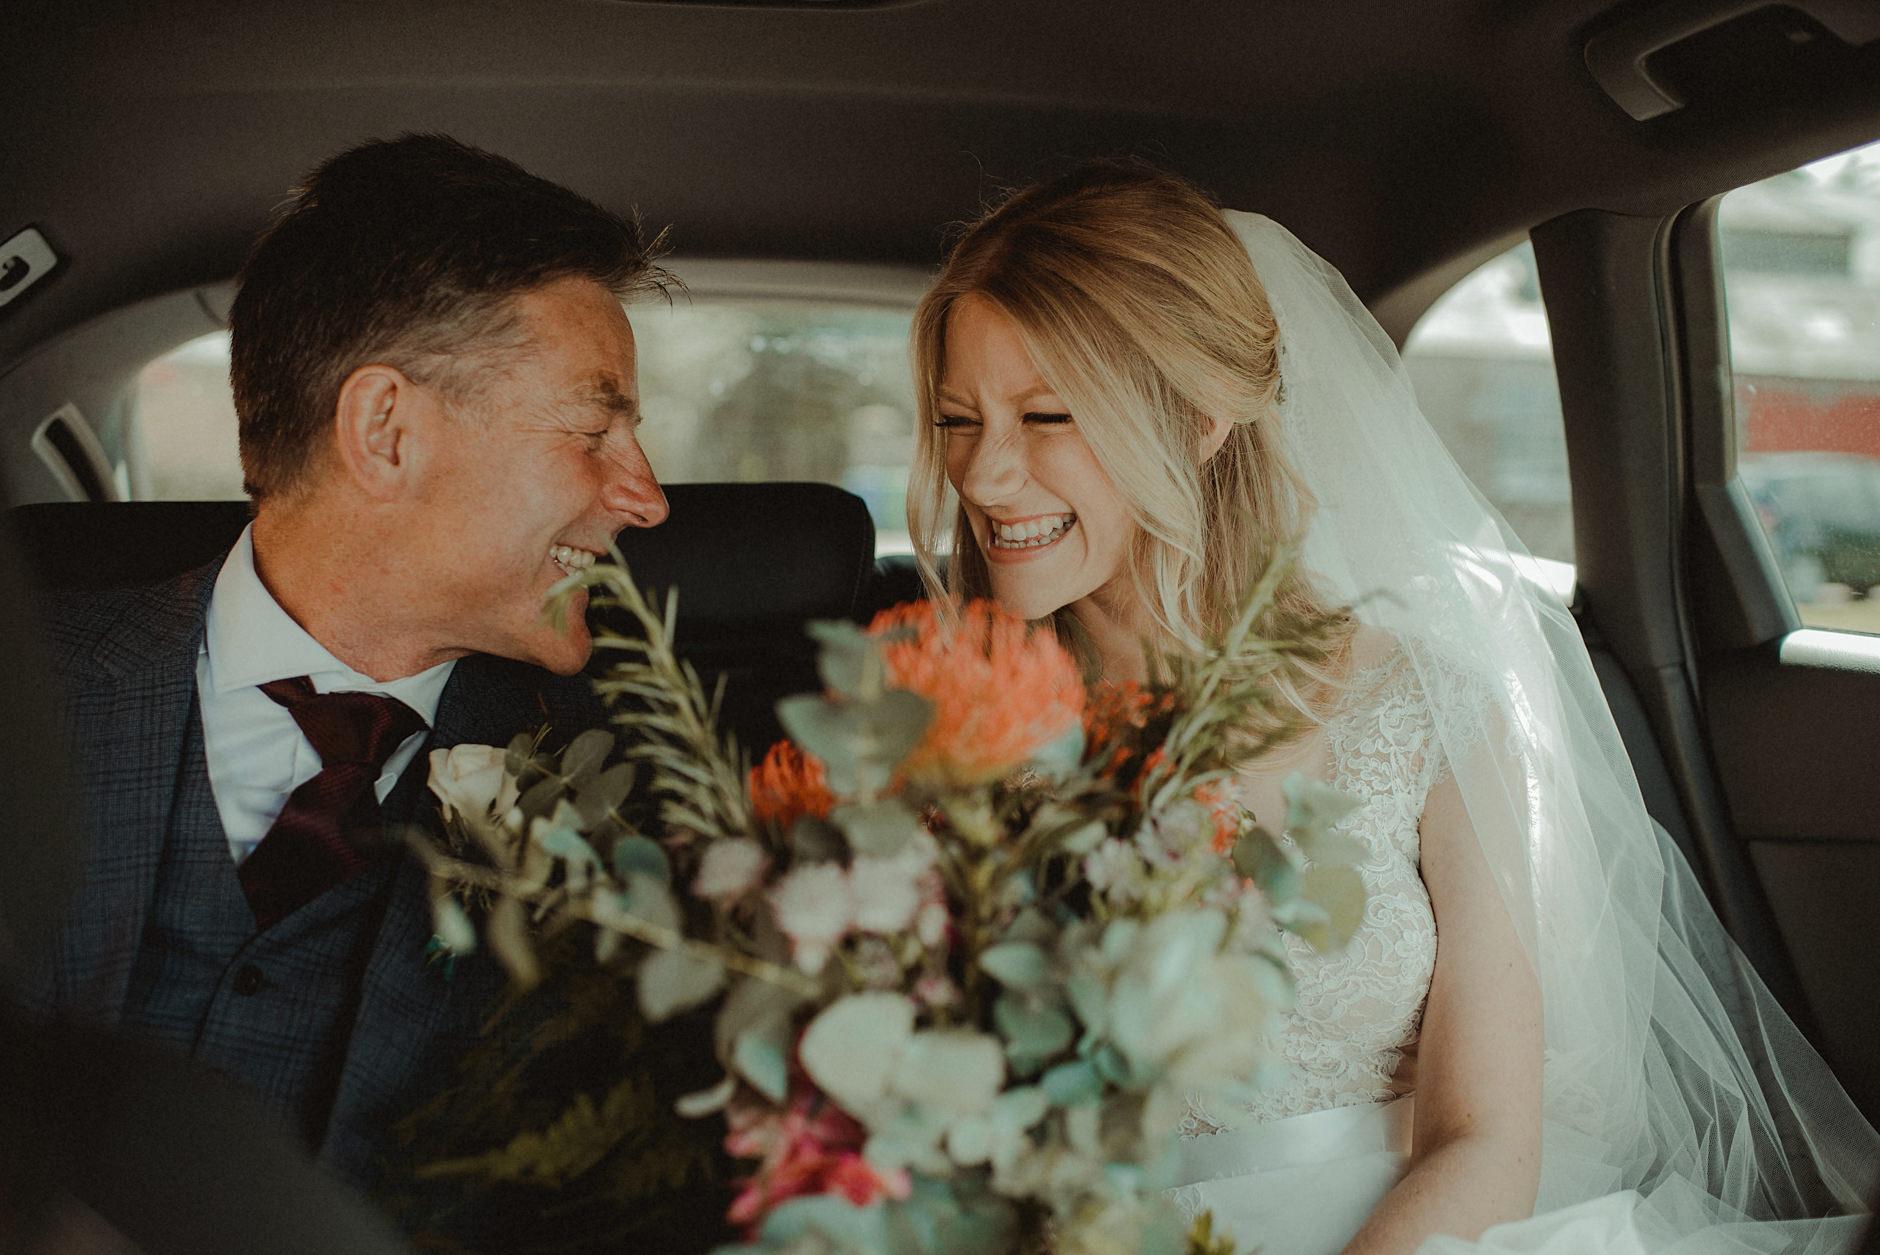 Alternative_wedding_photographer_scotland_nikki_leadbetter-154.jpg